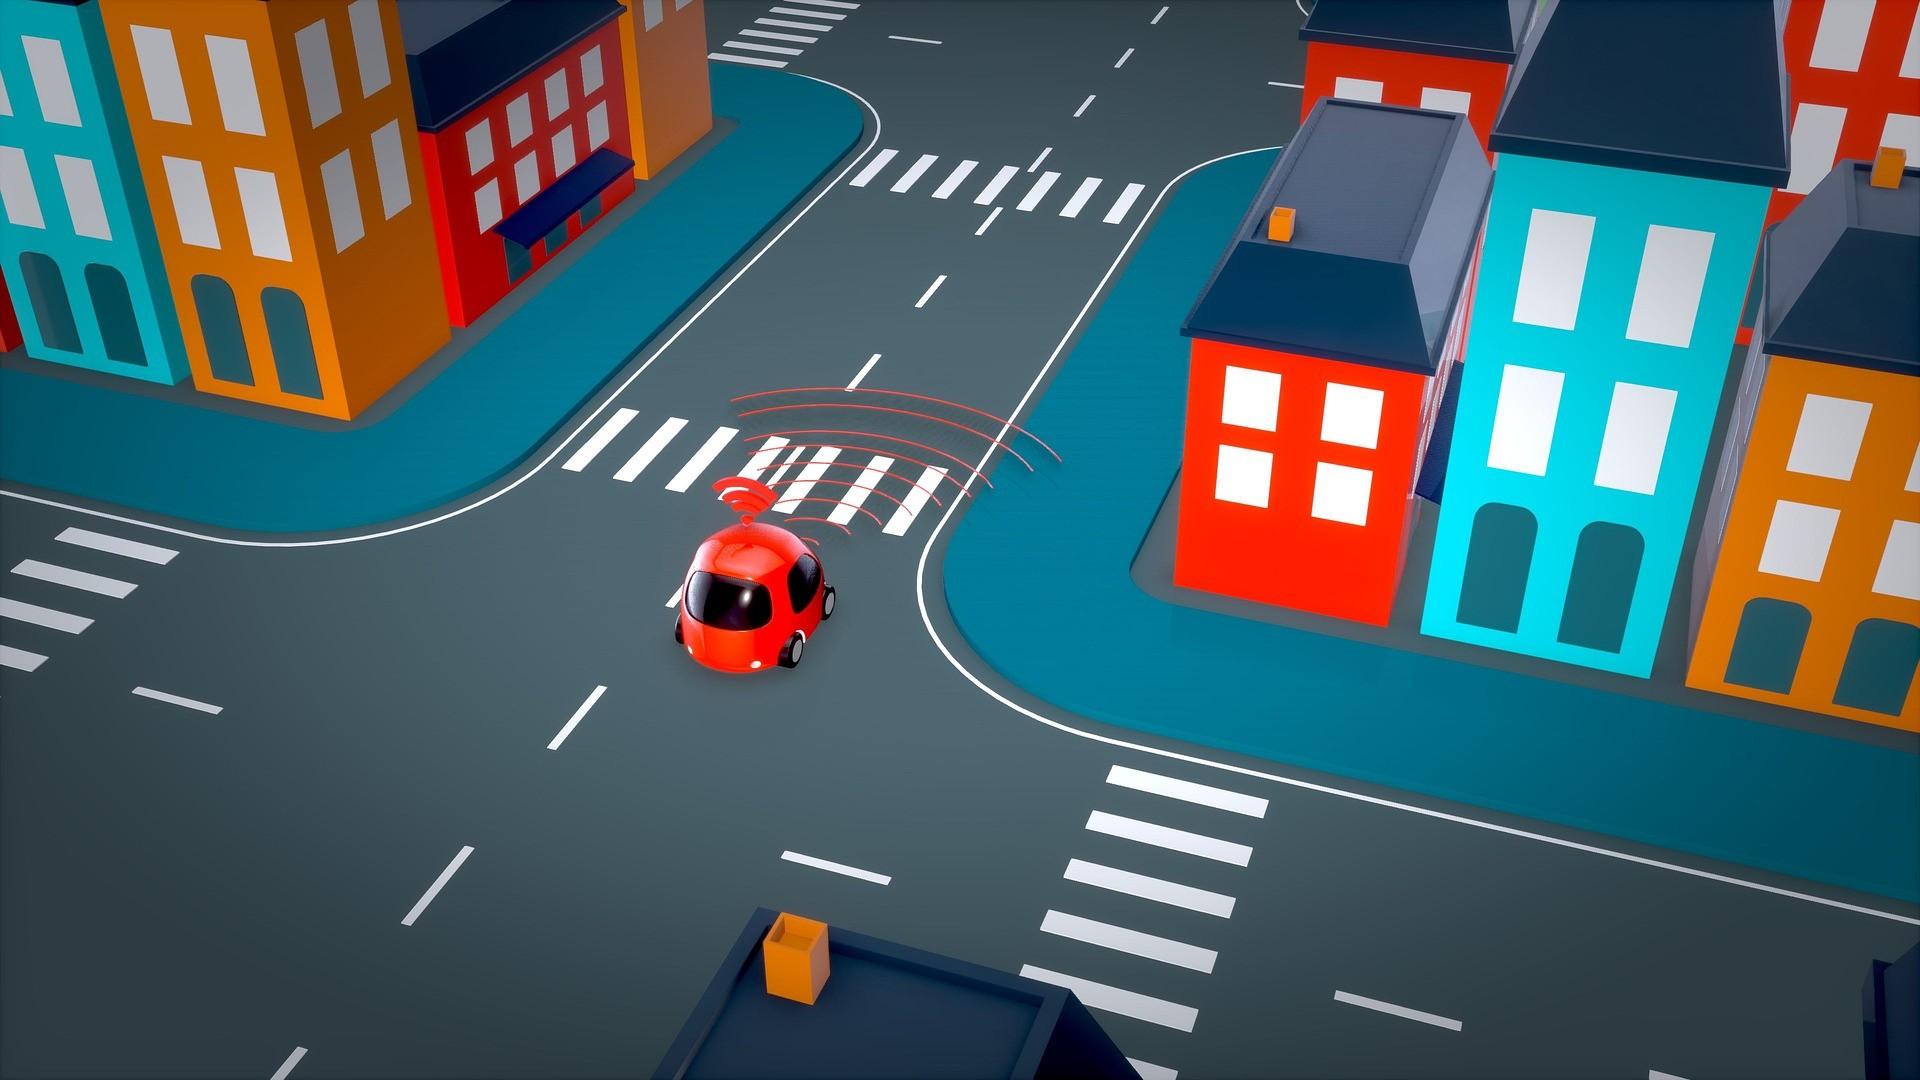 crossroad with a car transmitting a signal